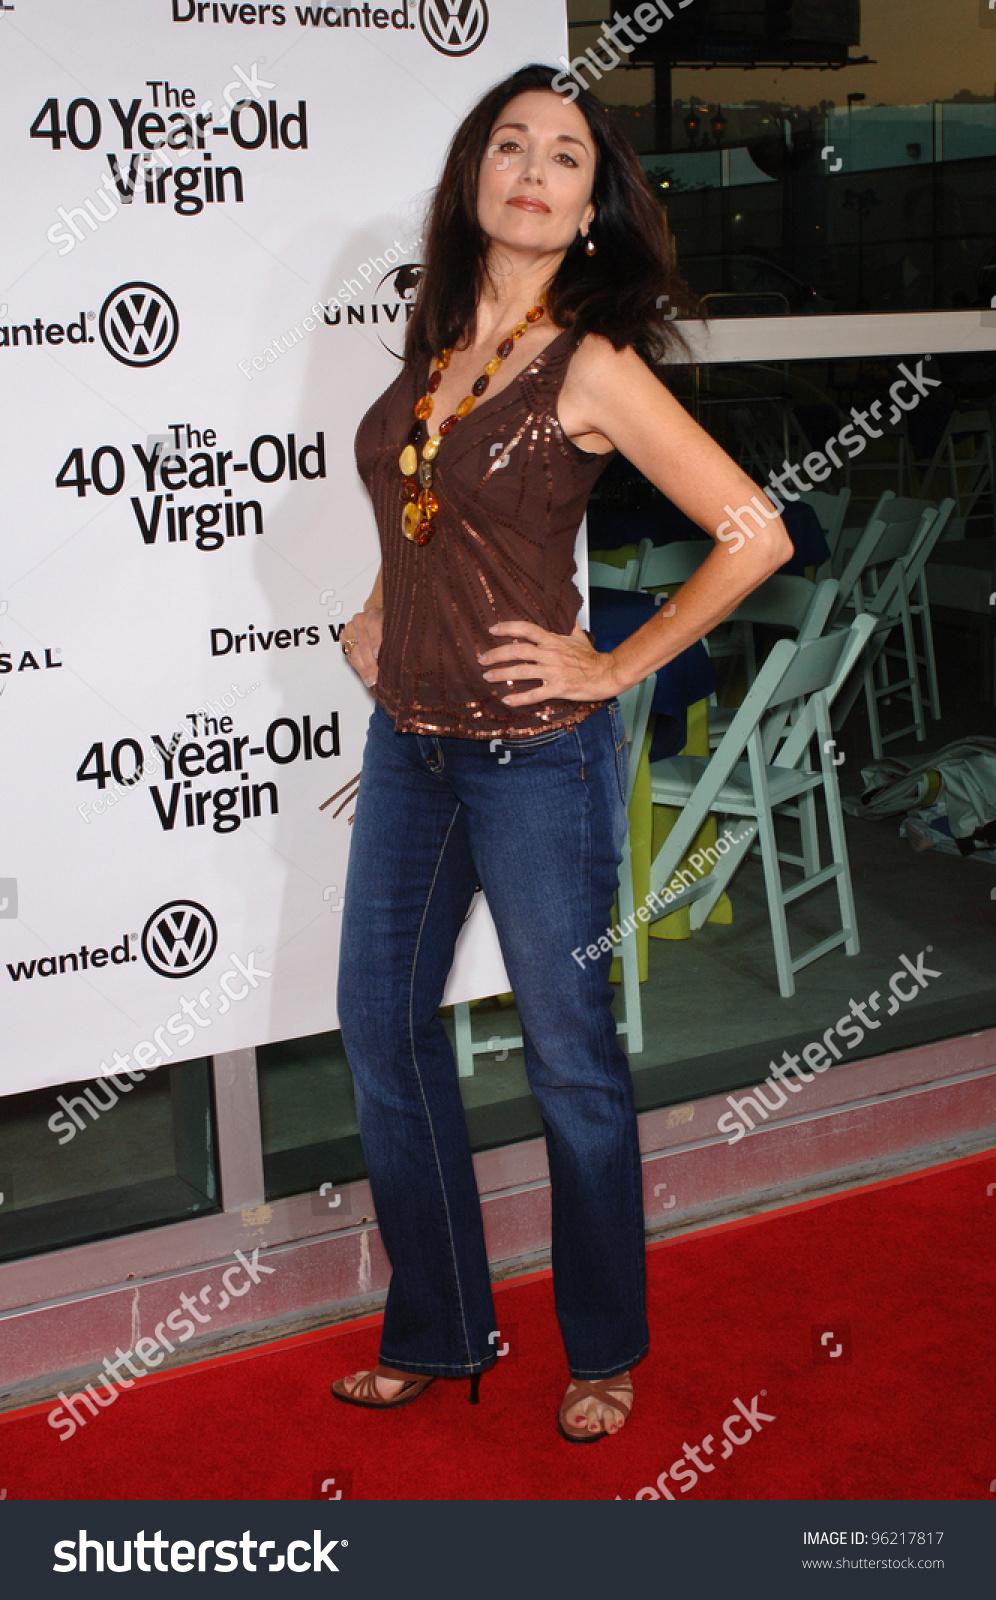 Fanny Blankers-Koen 4 Olympic medals,Alla Korot XXX pics & movies Randall Edwards (actress),Nicole Scherzinger